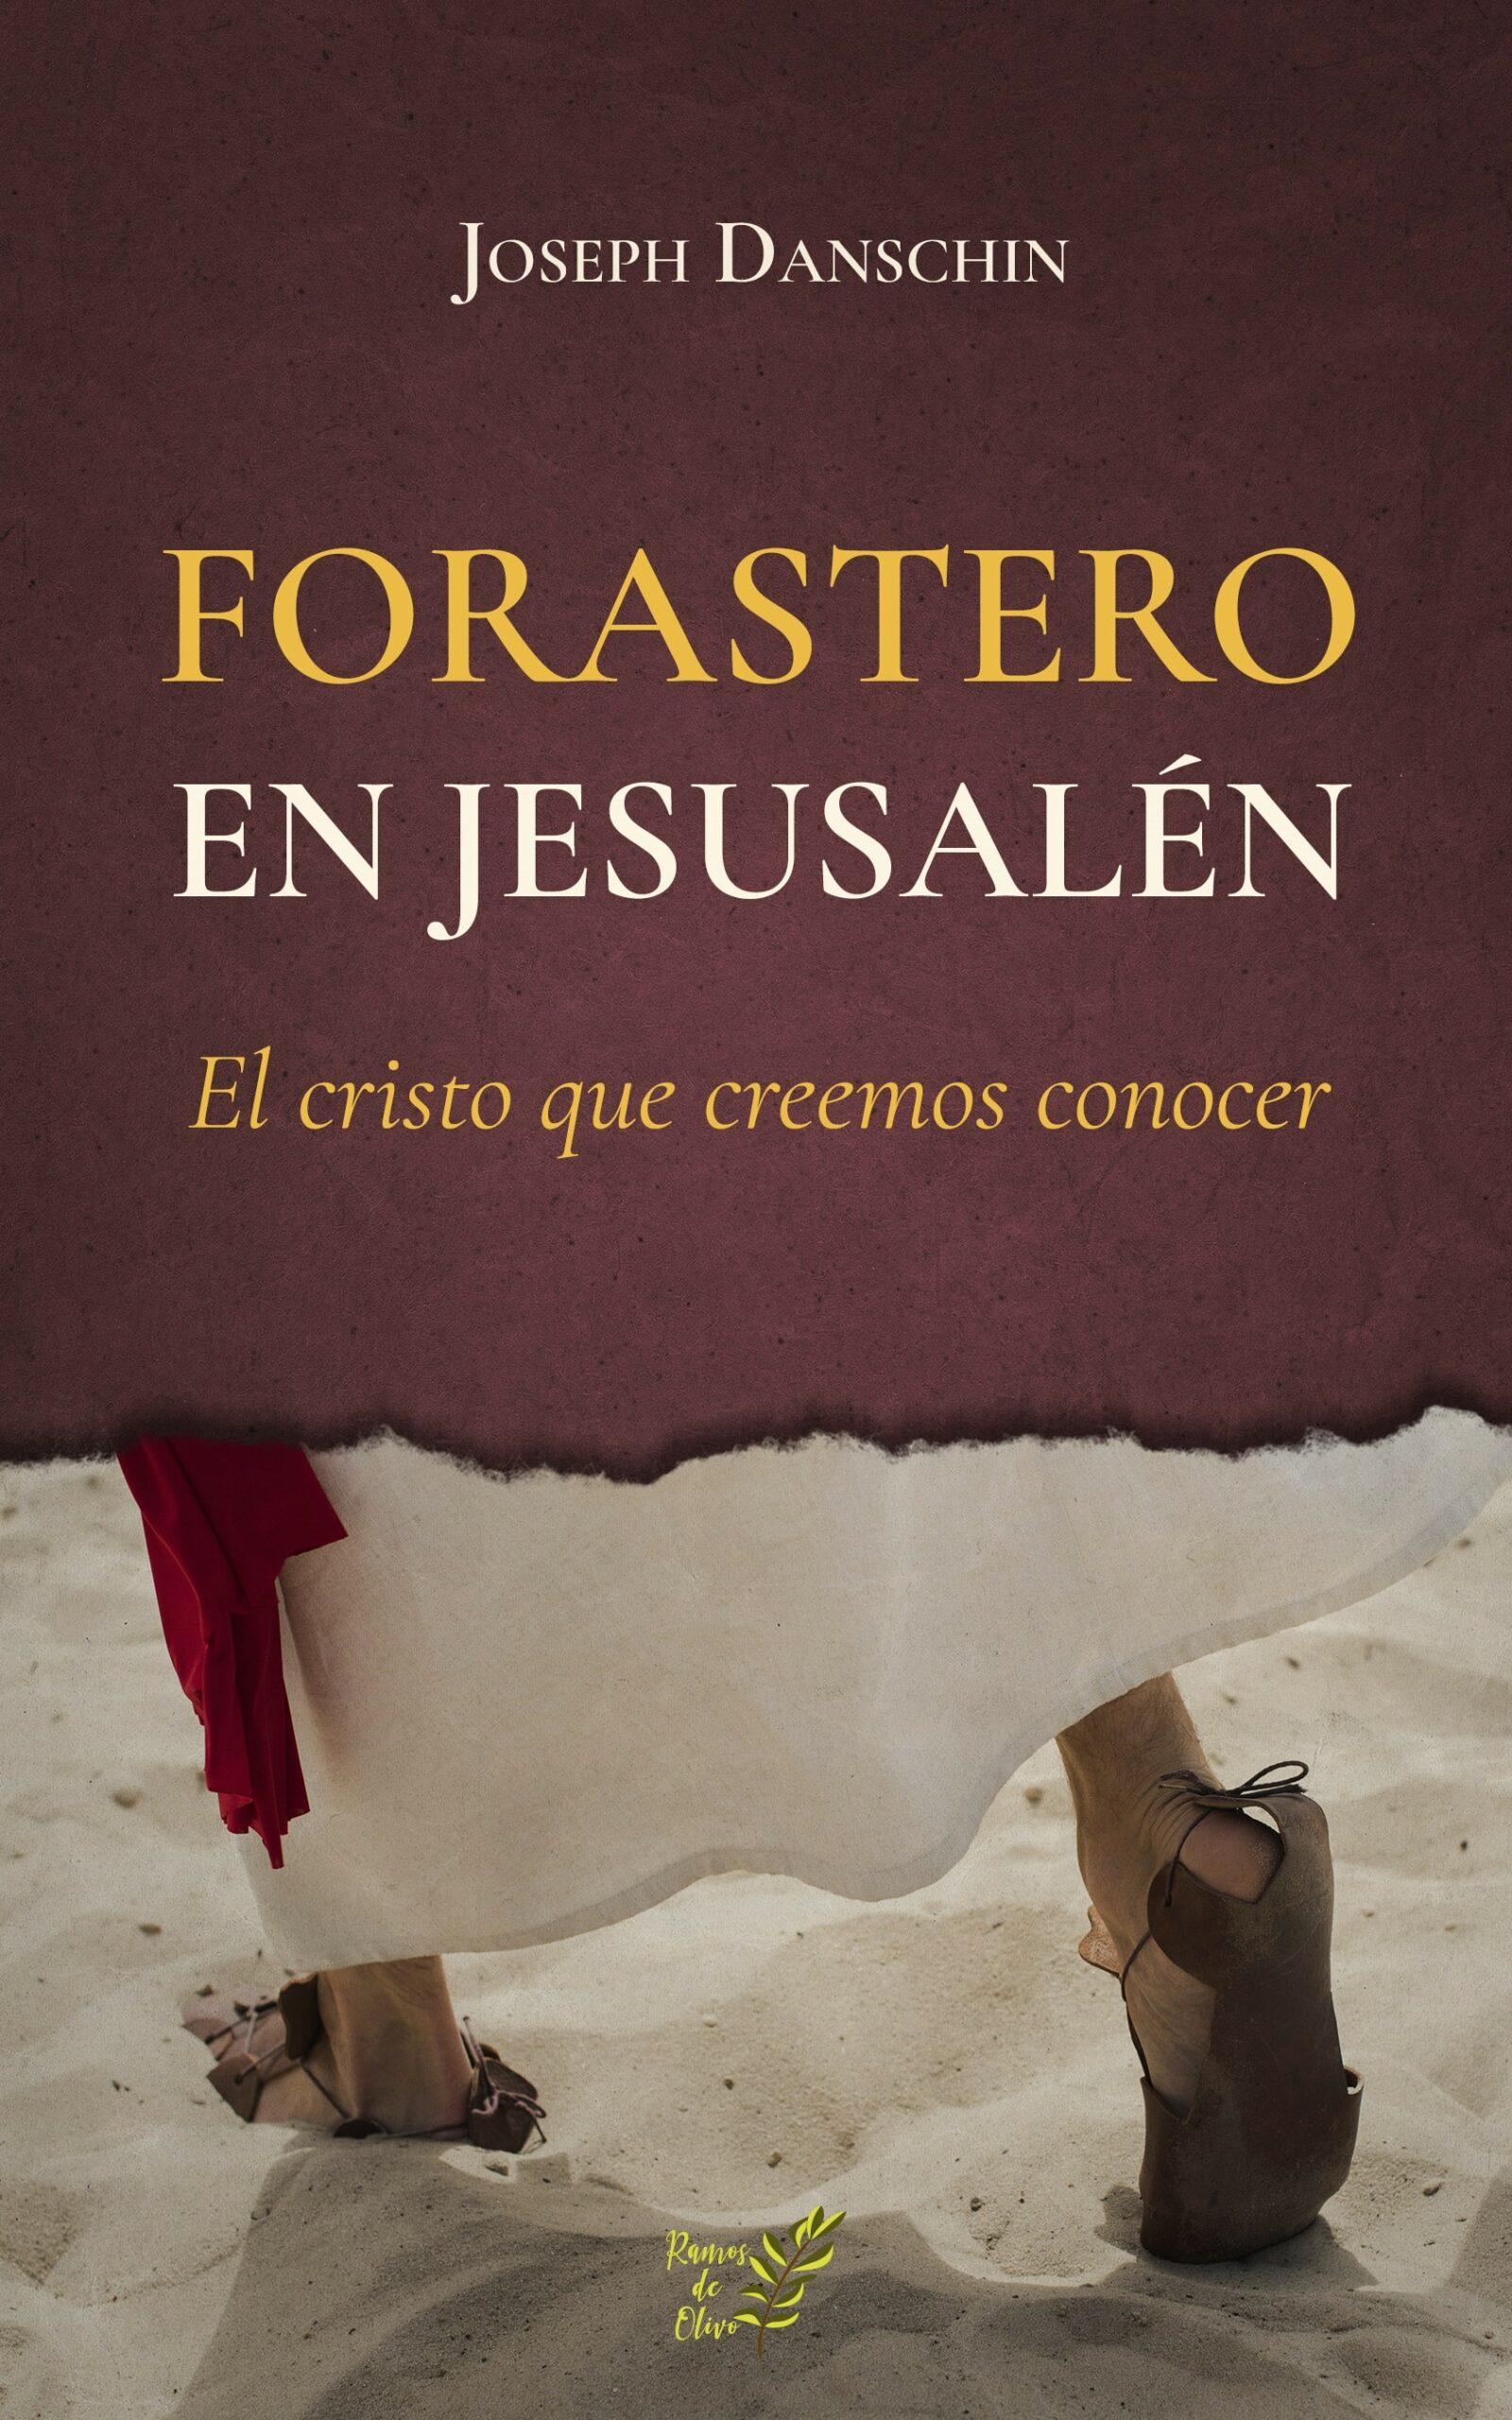 Forastero en Jerusalén JOSEPH DANSCHIN